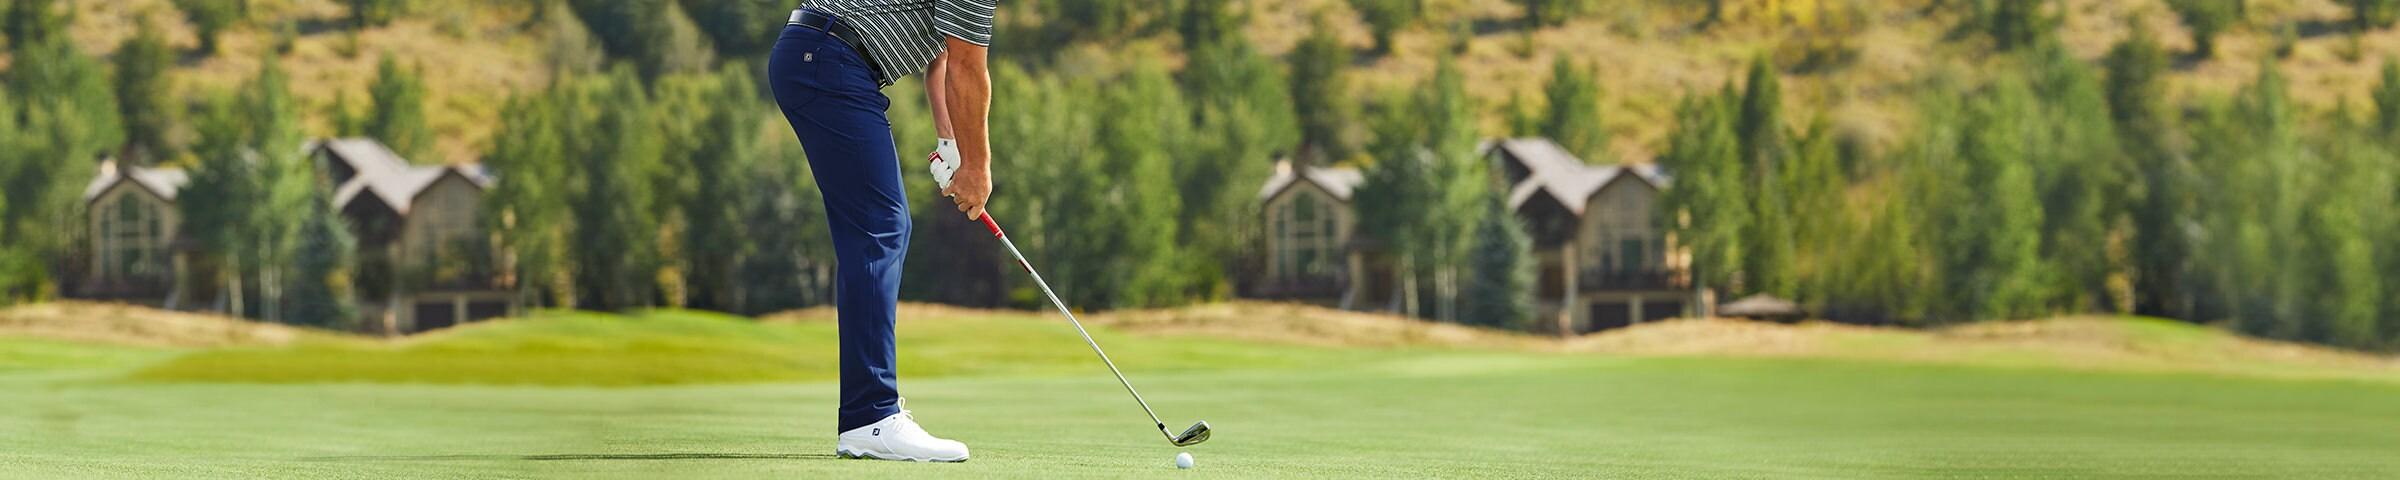 FootJoy 2019 Men's Golf Pants